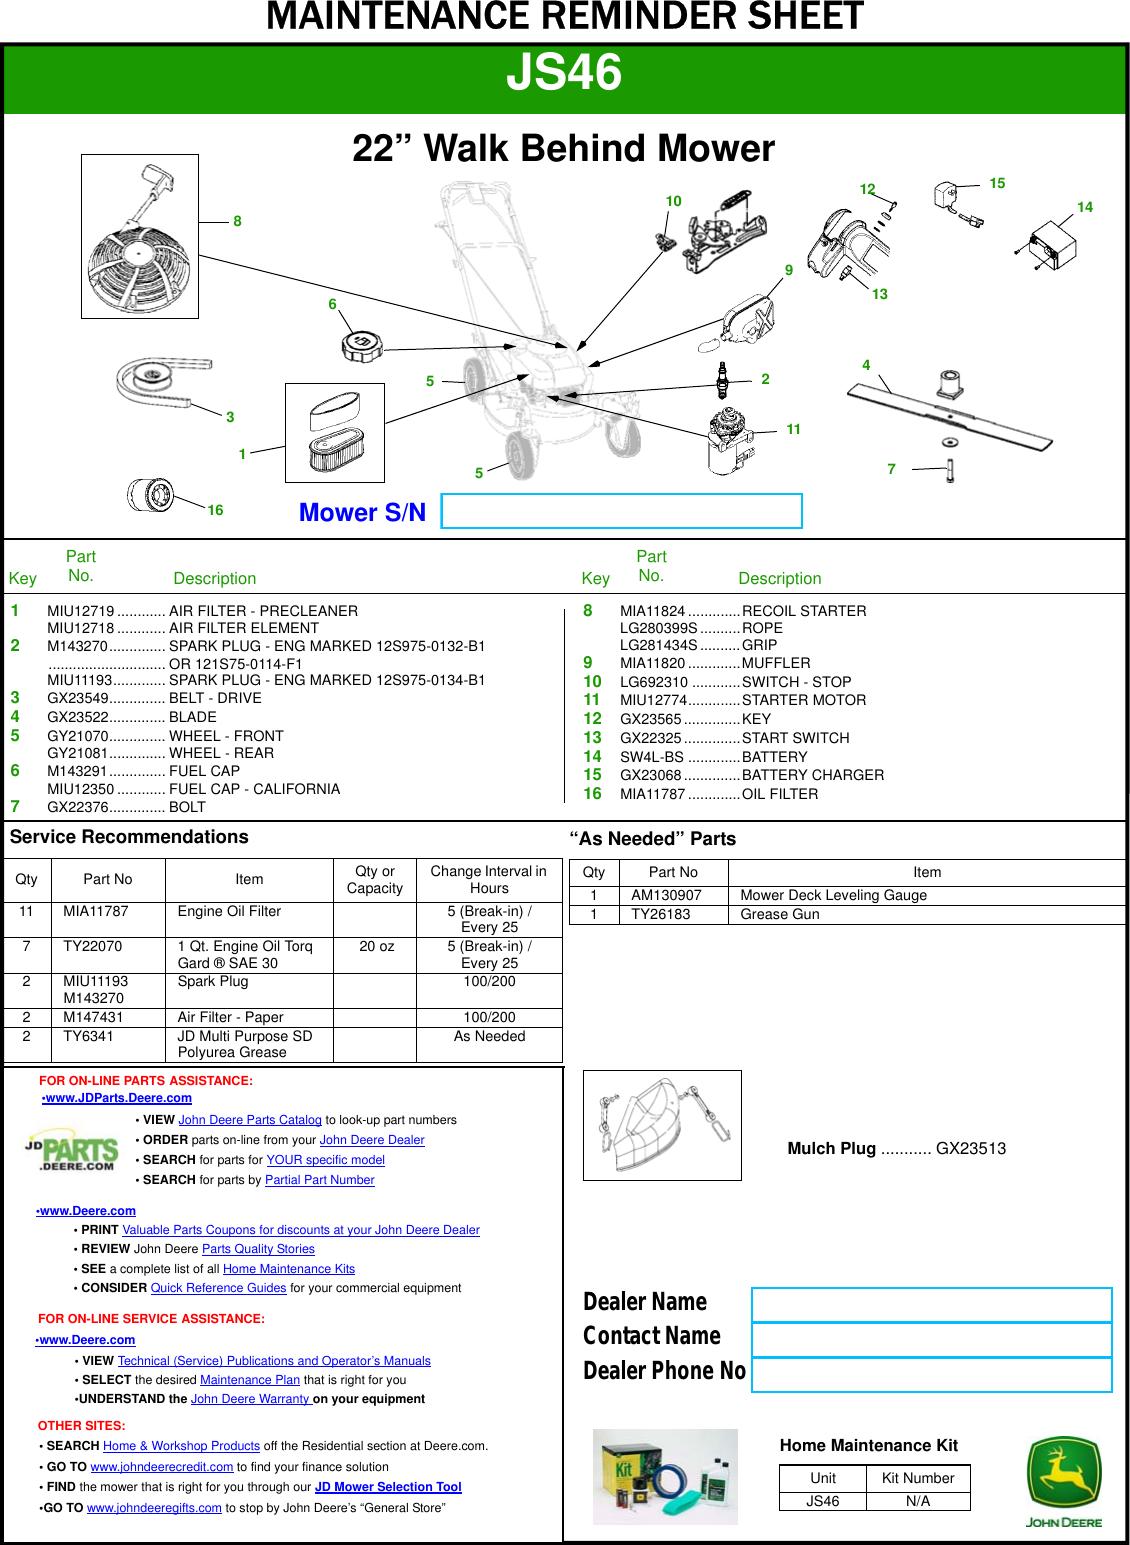 John Deere Js46 Users Manual